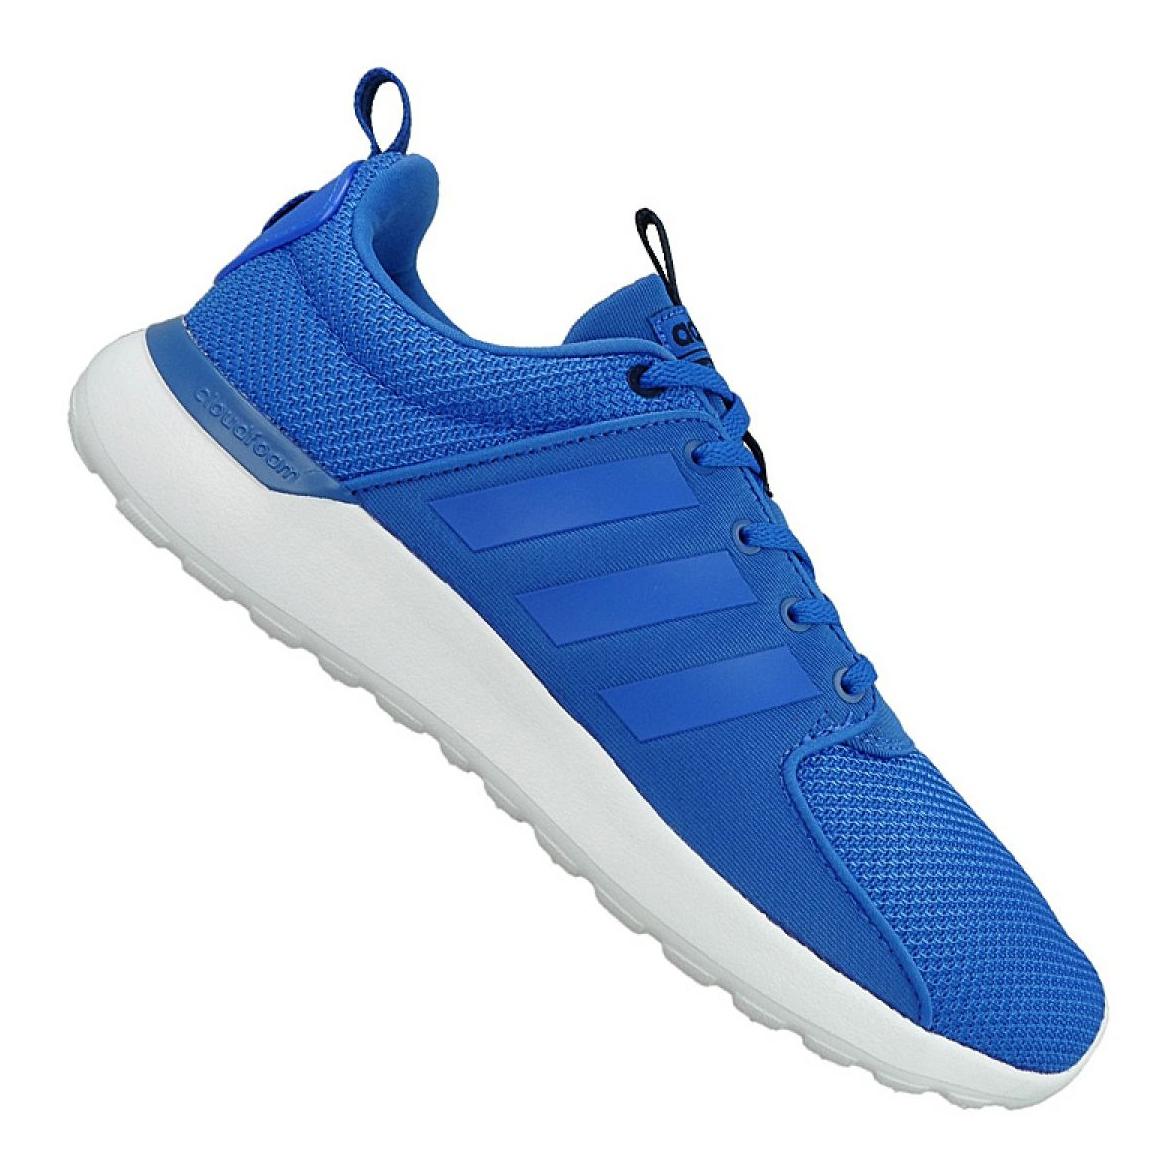 Adidas Cloudfoam Lite Racer M AW4028 shoes blue